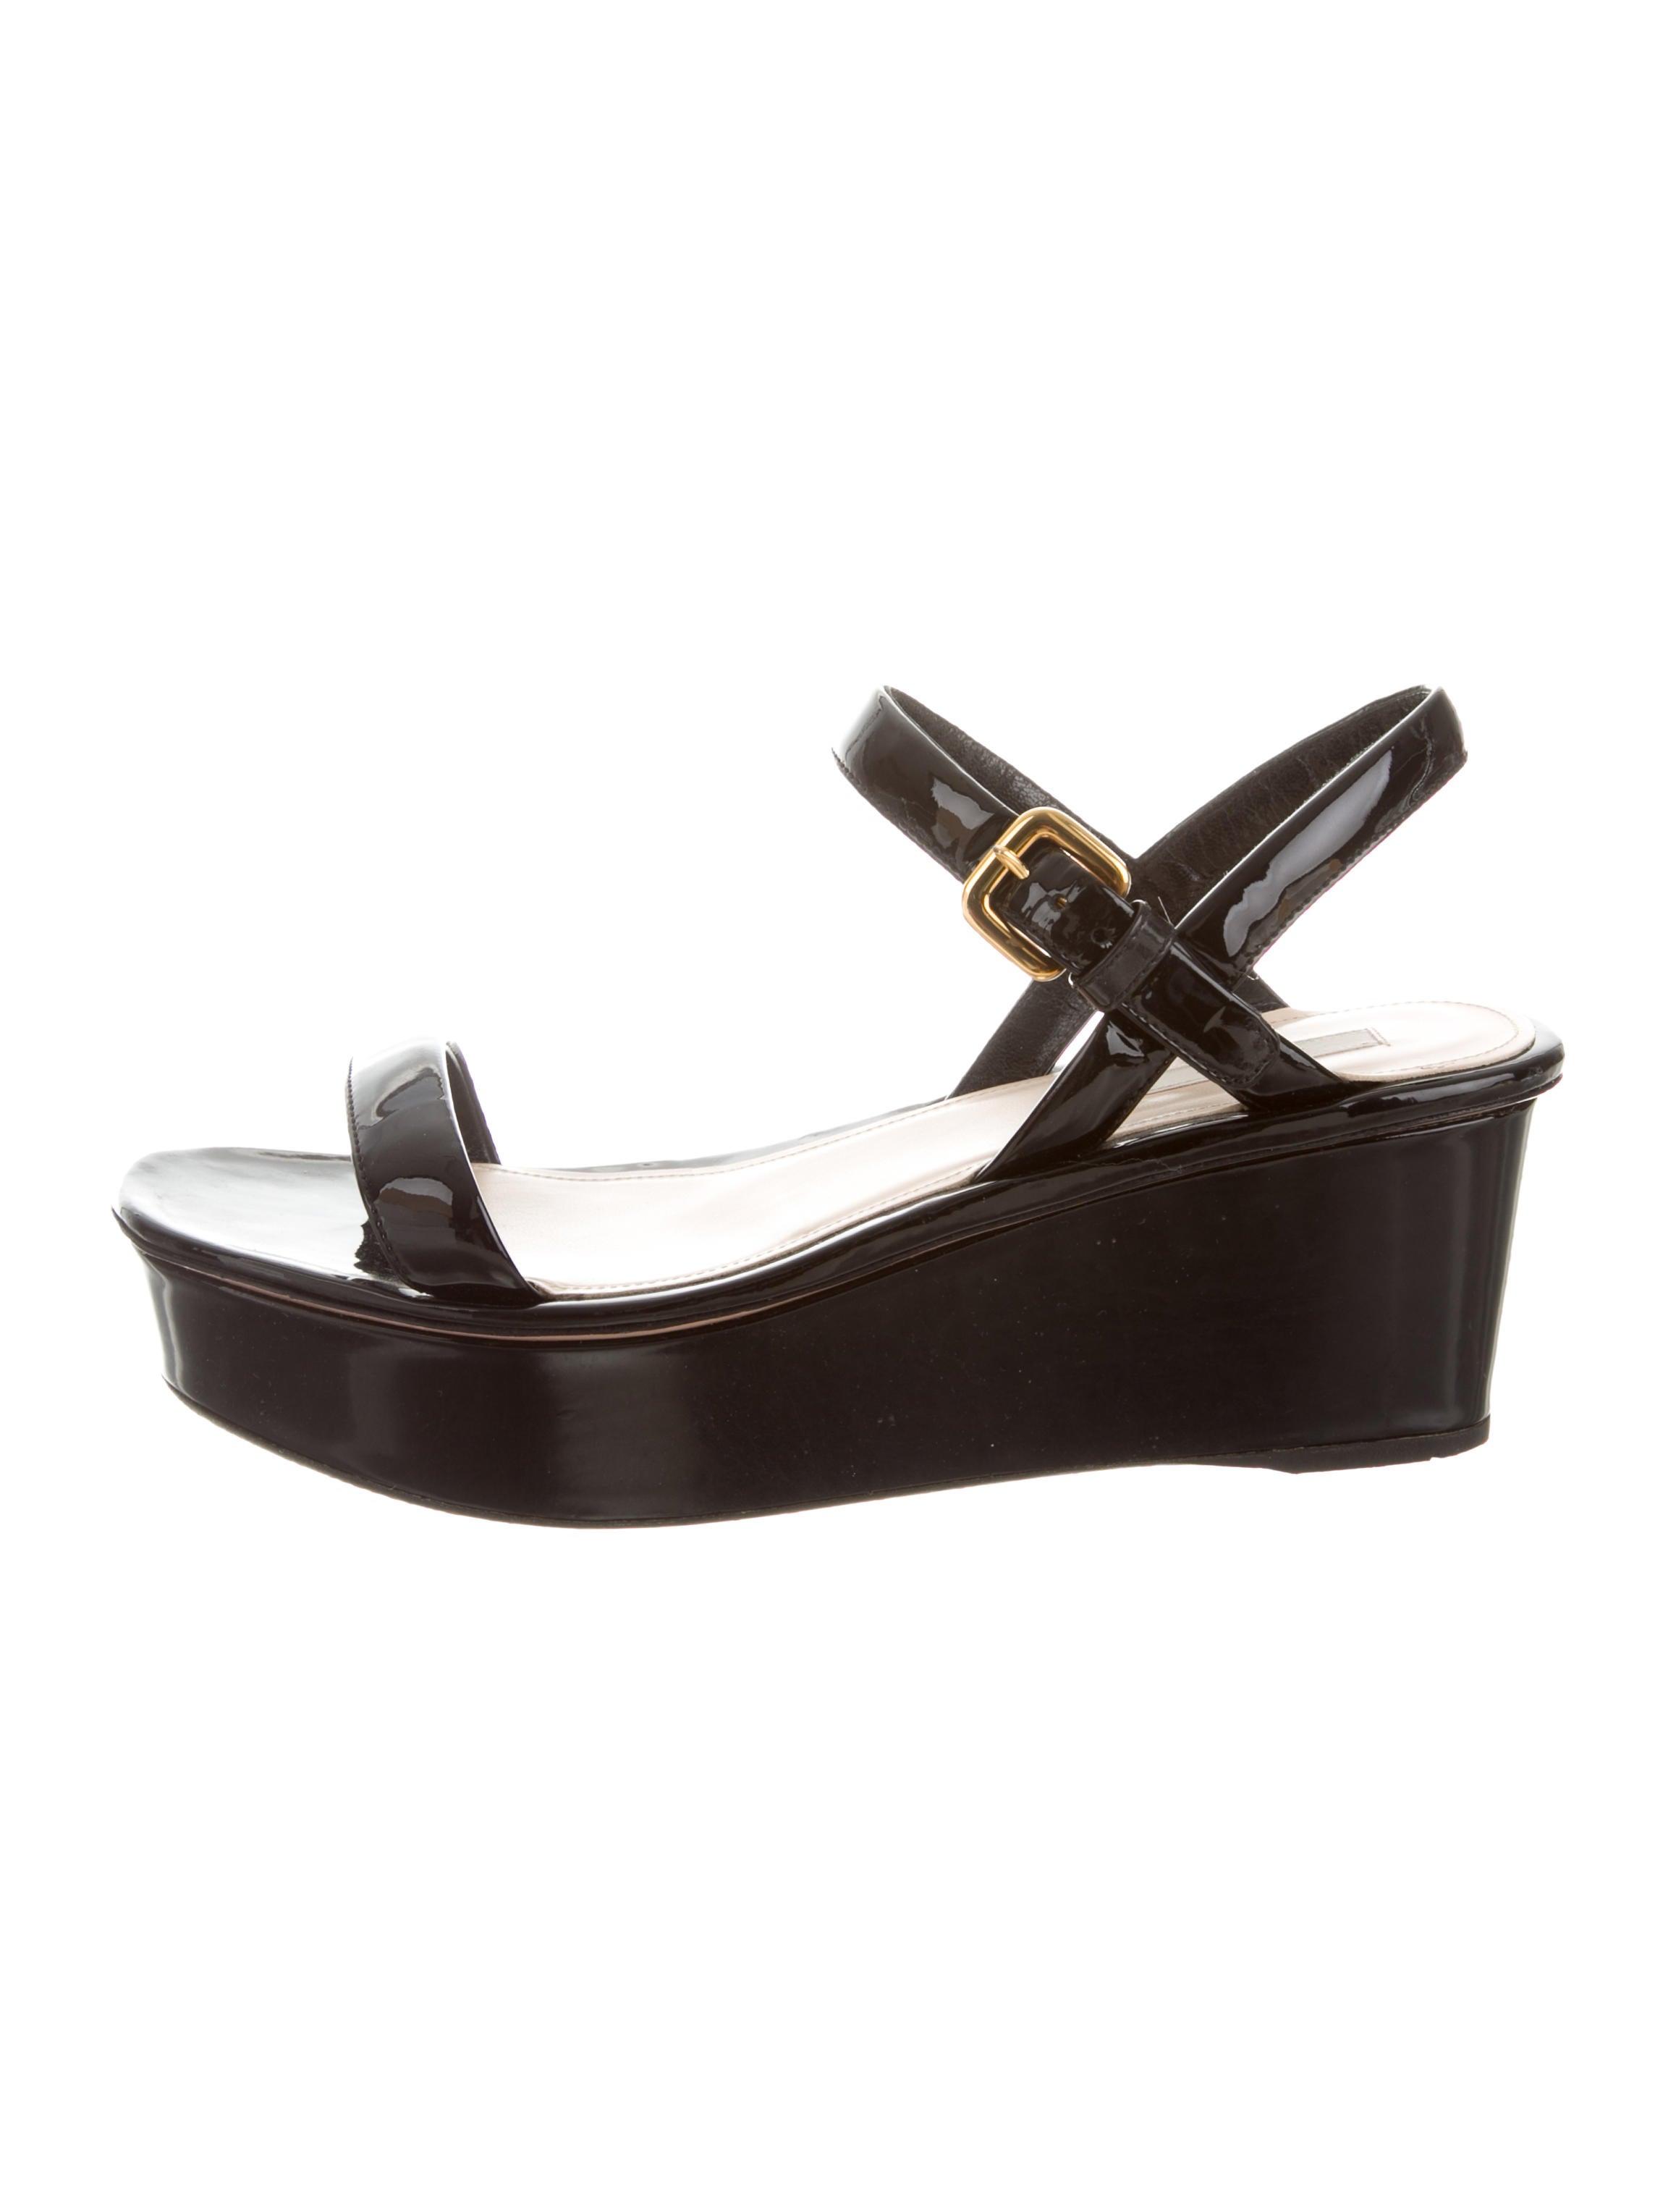 prada patent leather platform sandals shoes pra106066